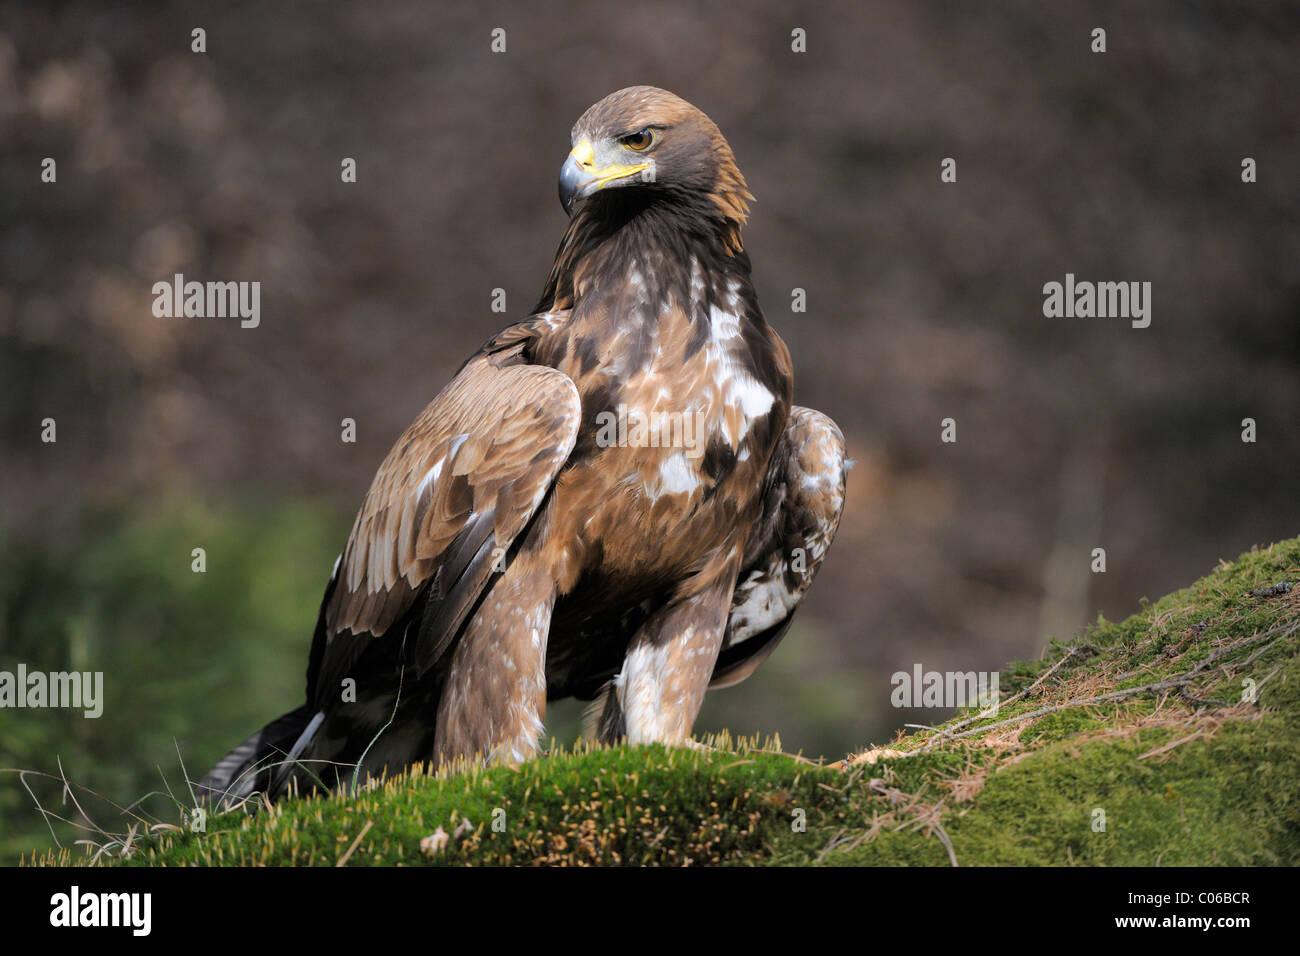 Golden eagle (Aquila chrysaetos) on a lookout, Landskron Castle Eagle Park, Carinthia, Austria, Europe Stock Photo